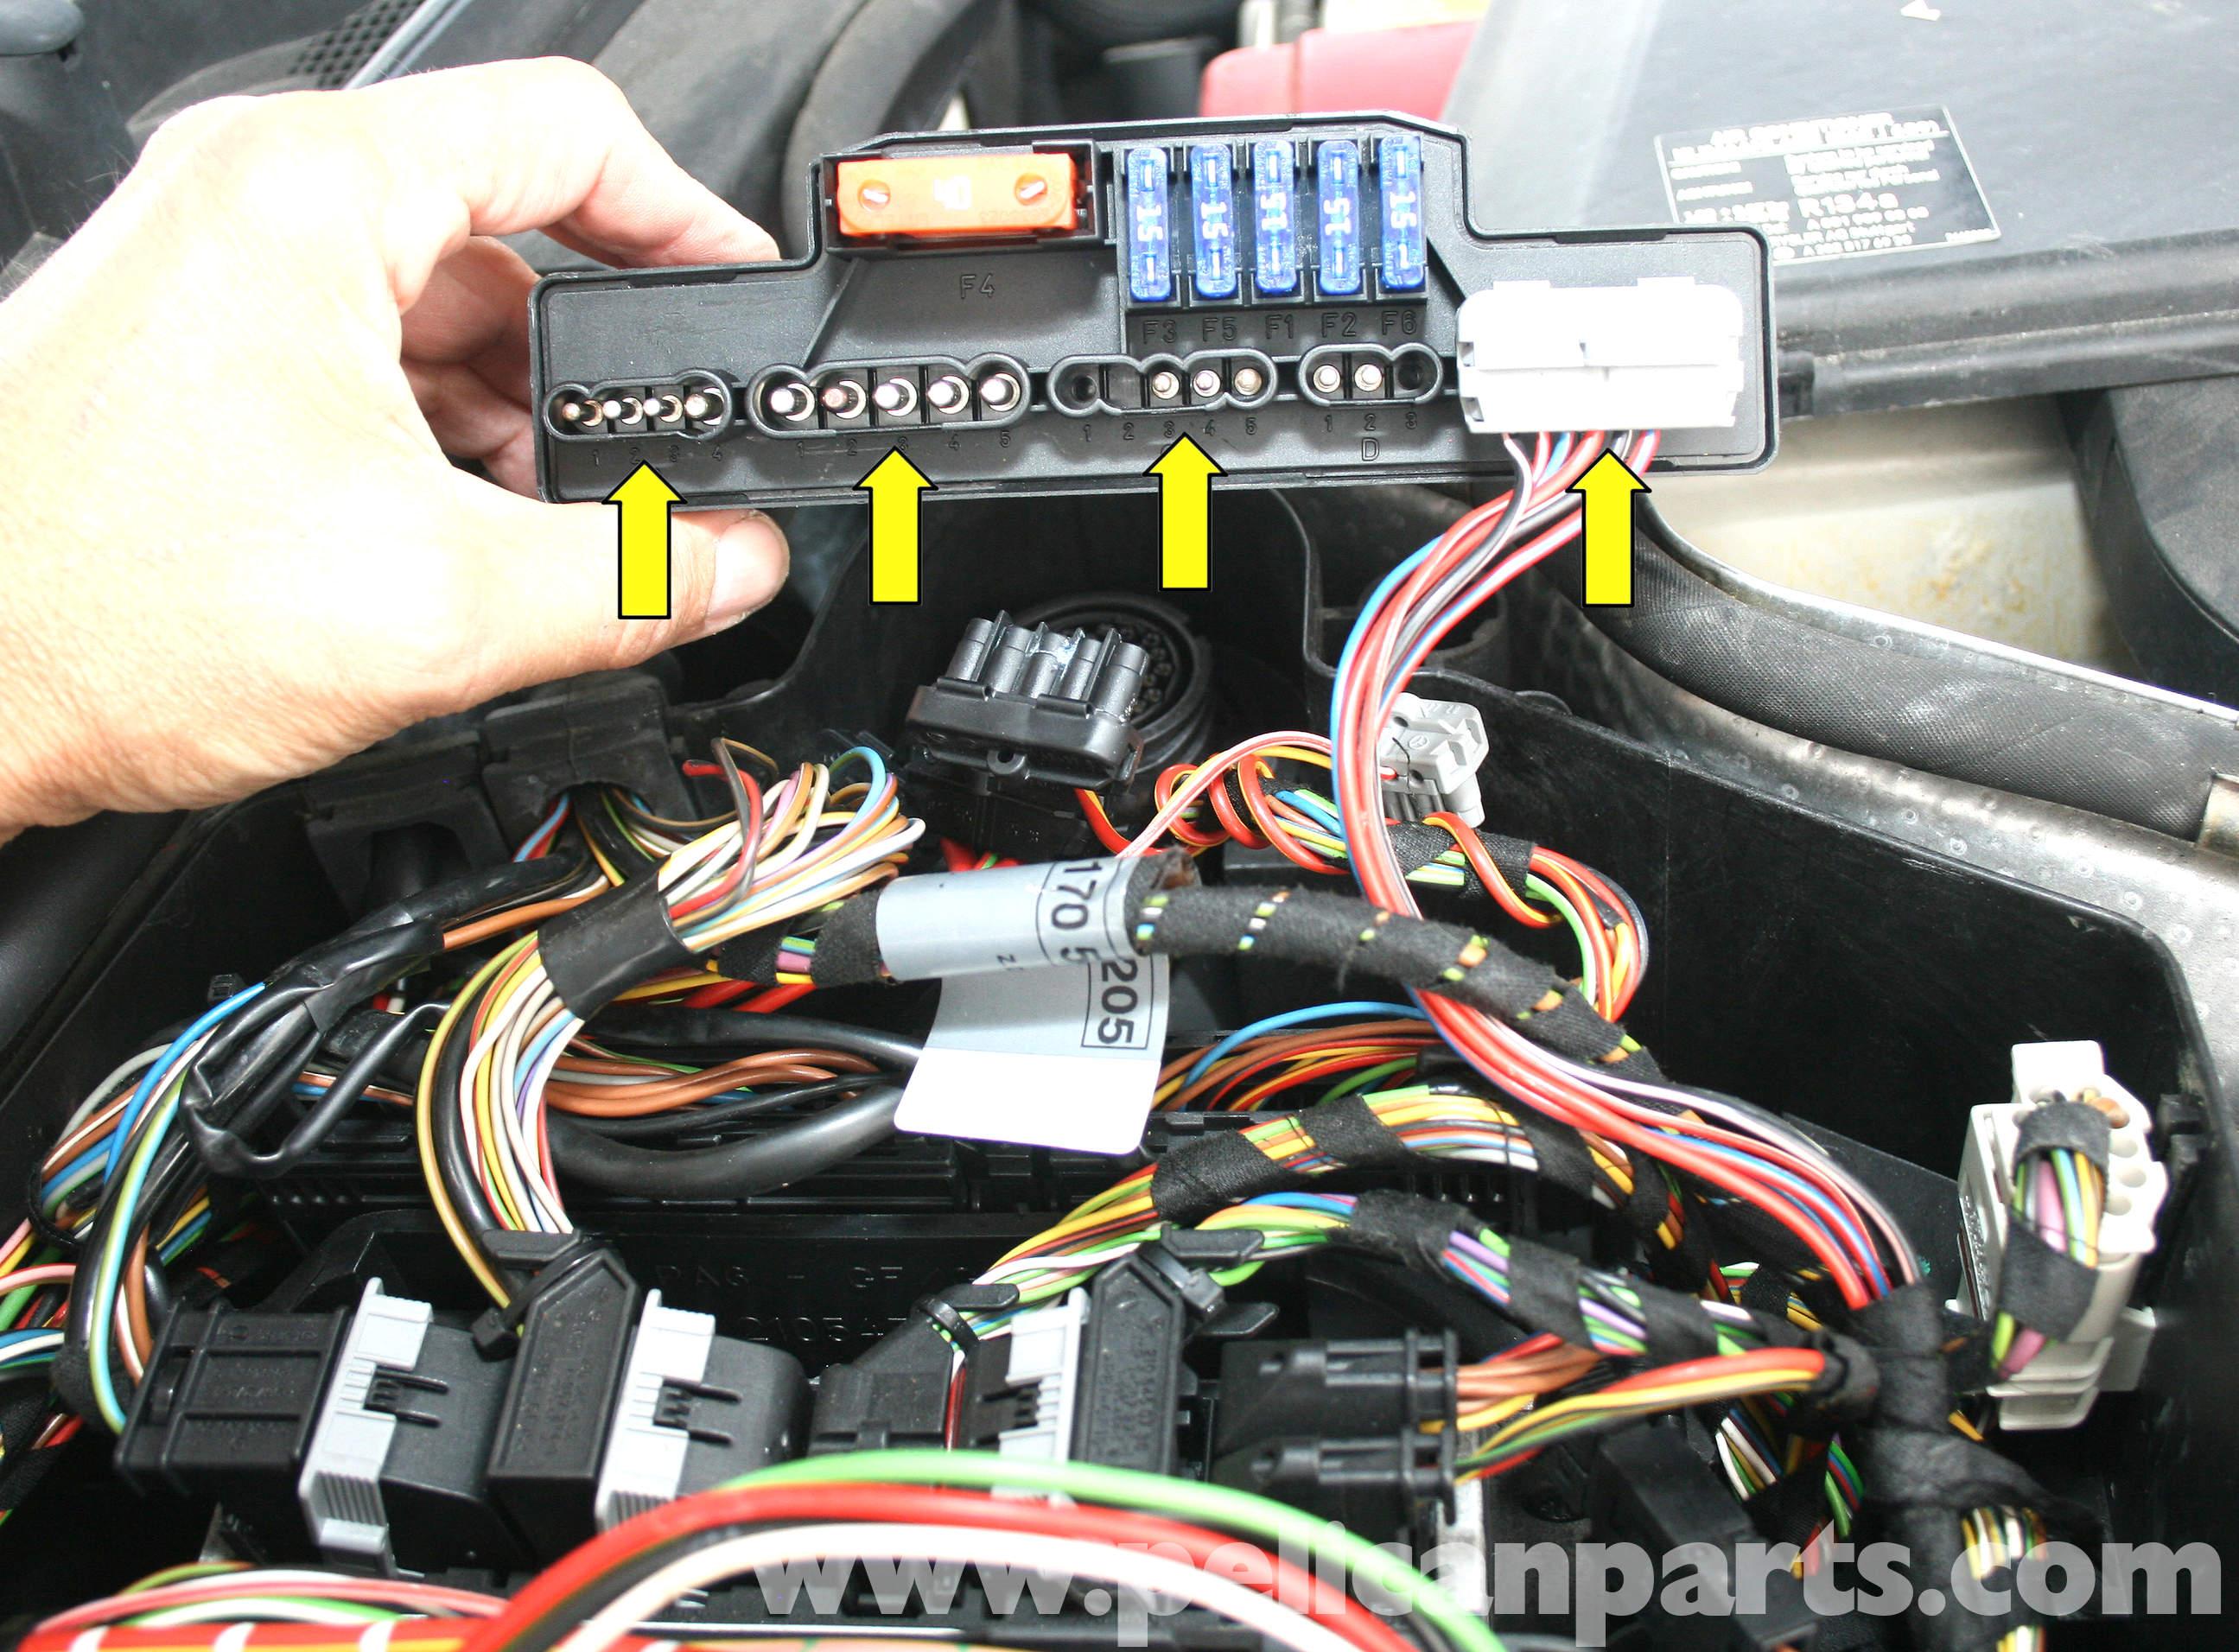 Mercedes Benz Wiring Harness Problems Library A Class Diagram Cd472f4c 9fde 4770 895b A383f2e29a05 K40 2